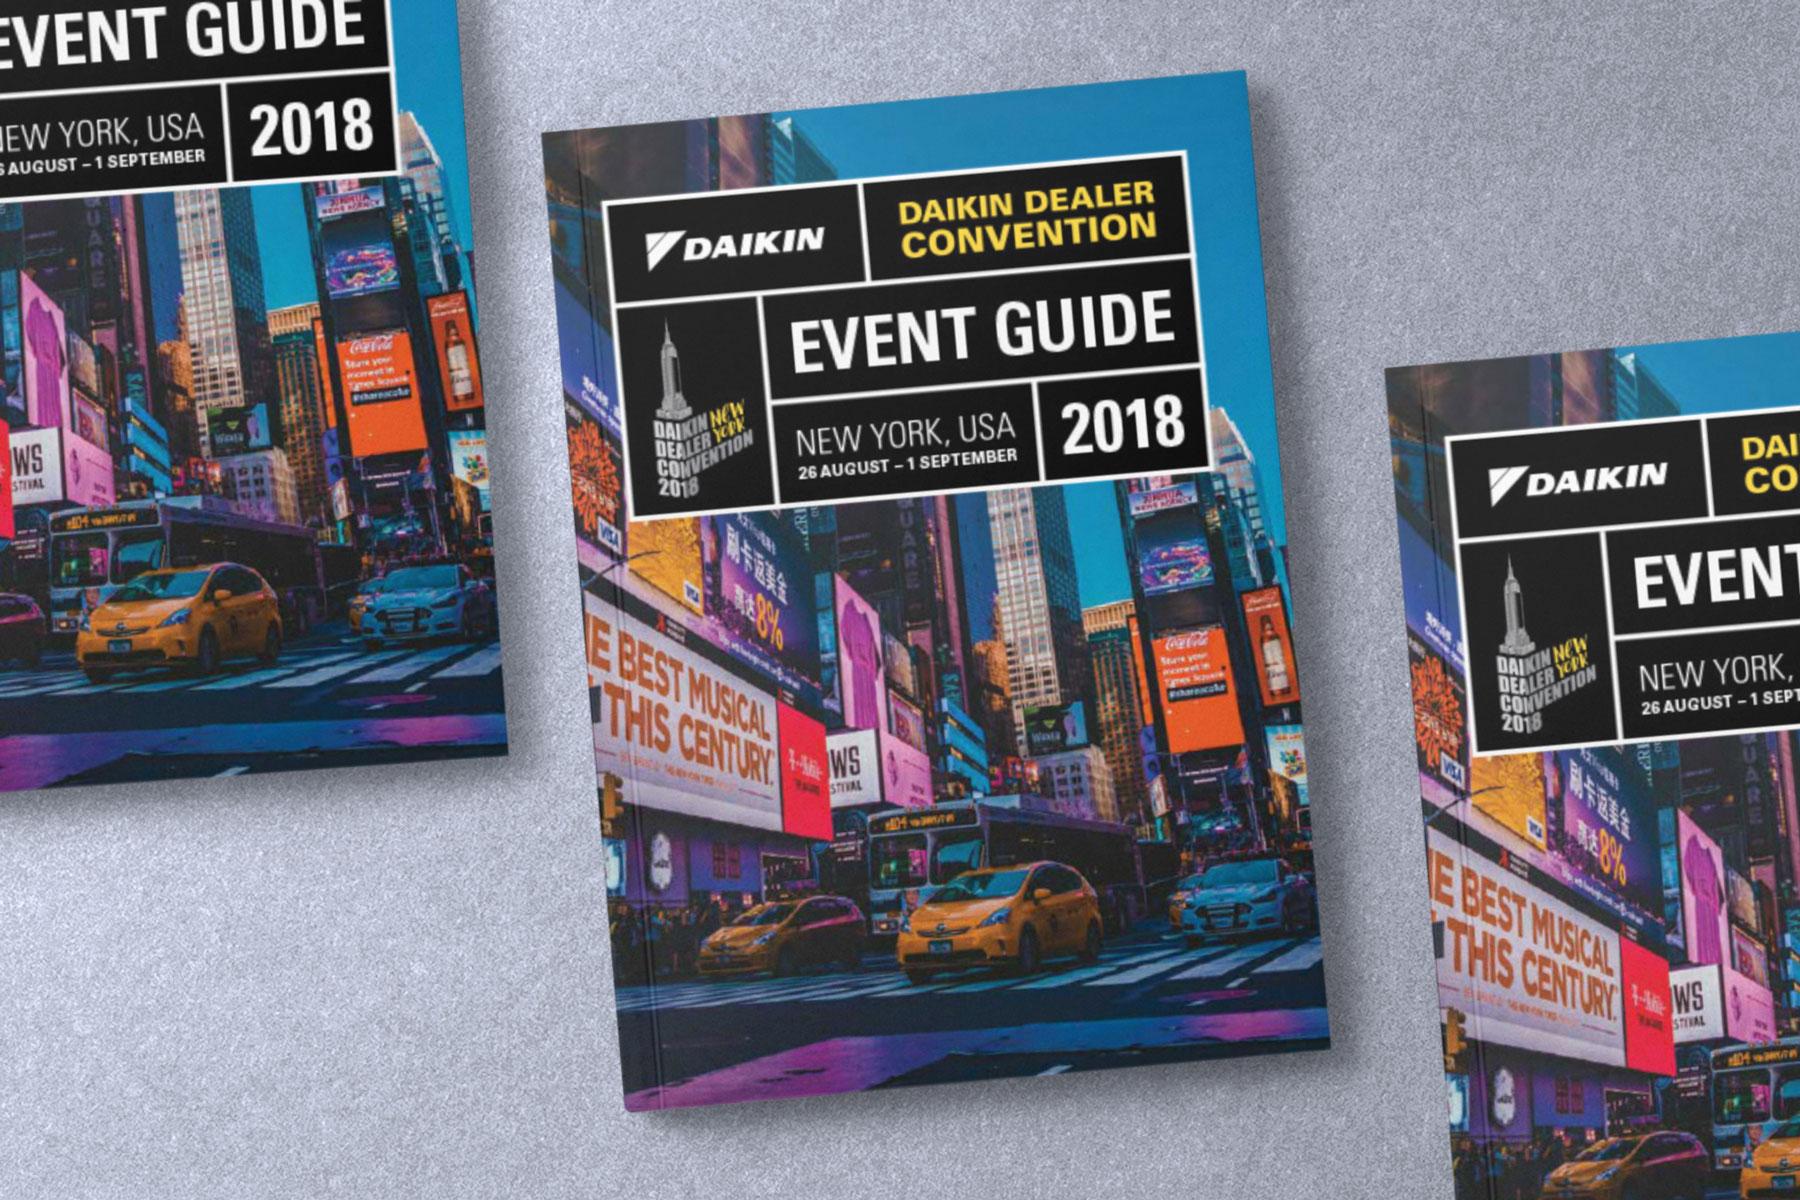 Daikin Dealer Convention Event Guide